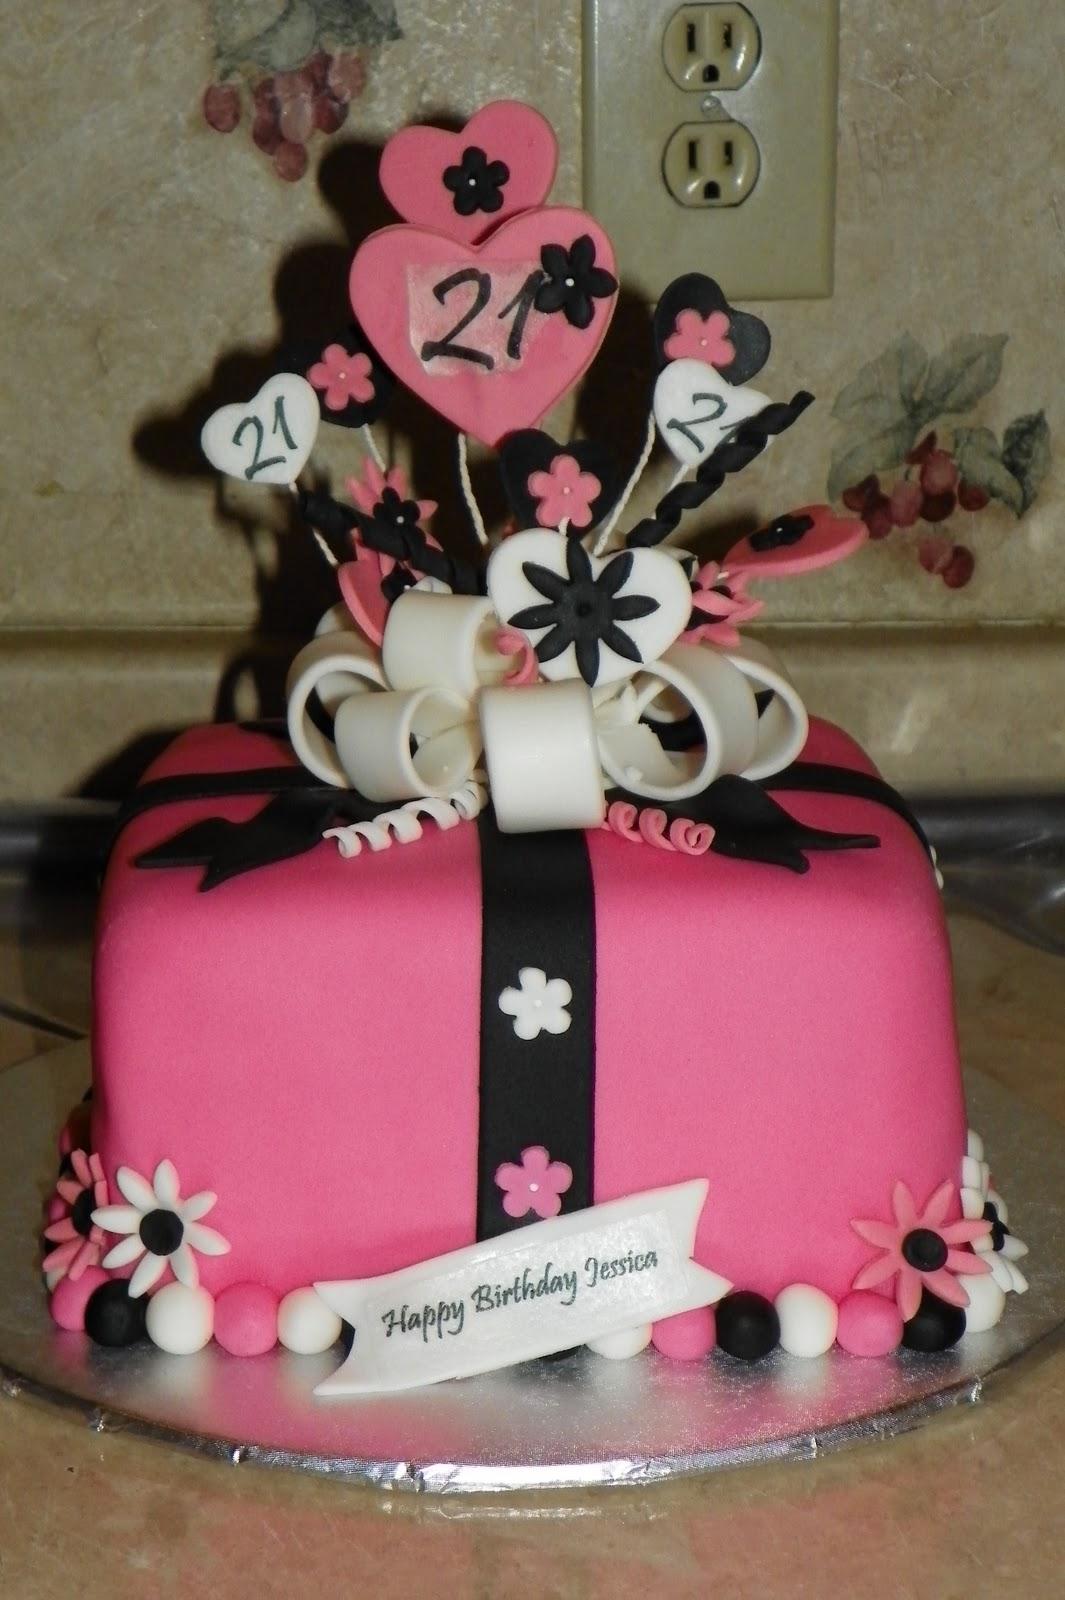 Awe Inspiring 11 Girly Cakes For Teens Photo Girly Birthday Cakes For Teen Funny Birthday Cards Online Fluifree Goldxyz